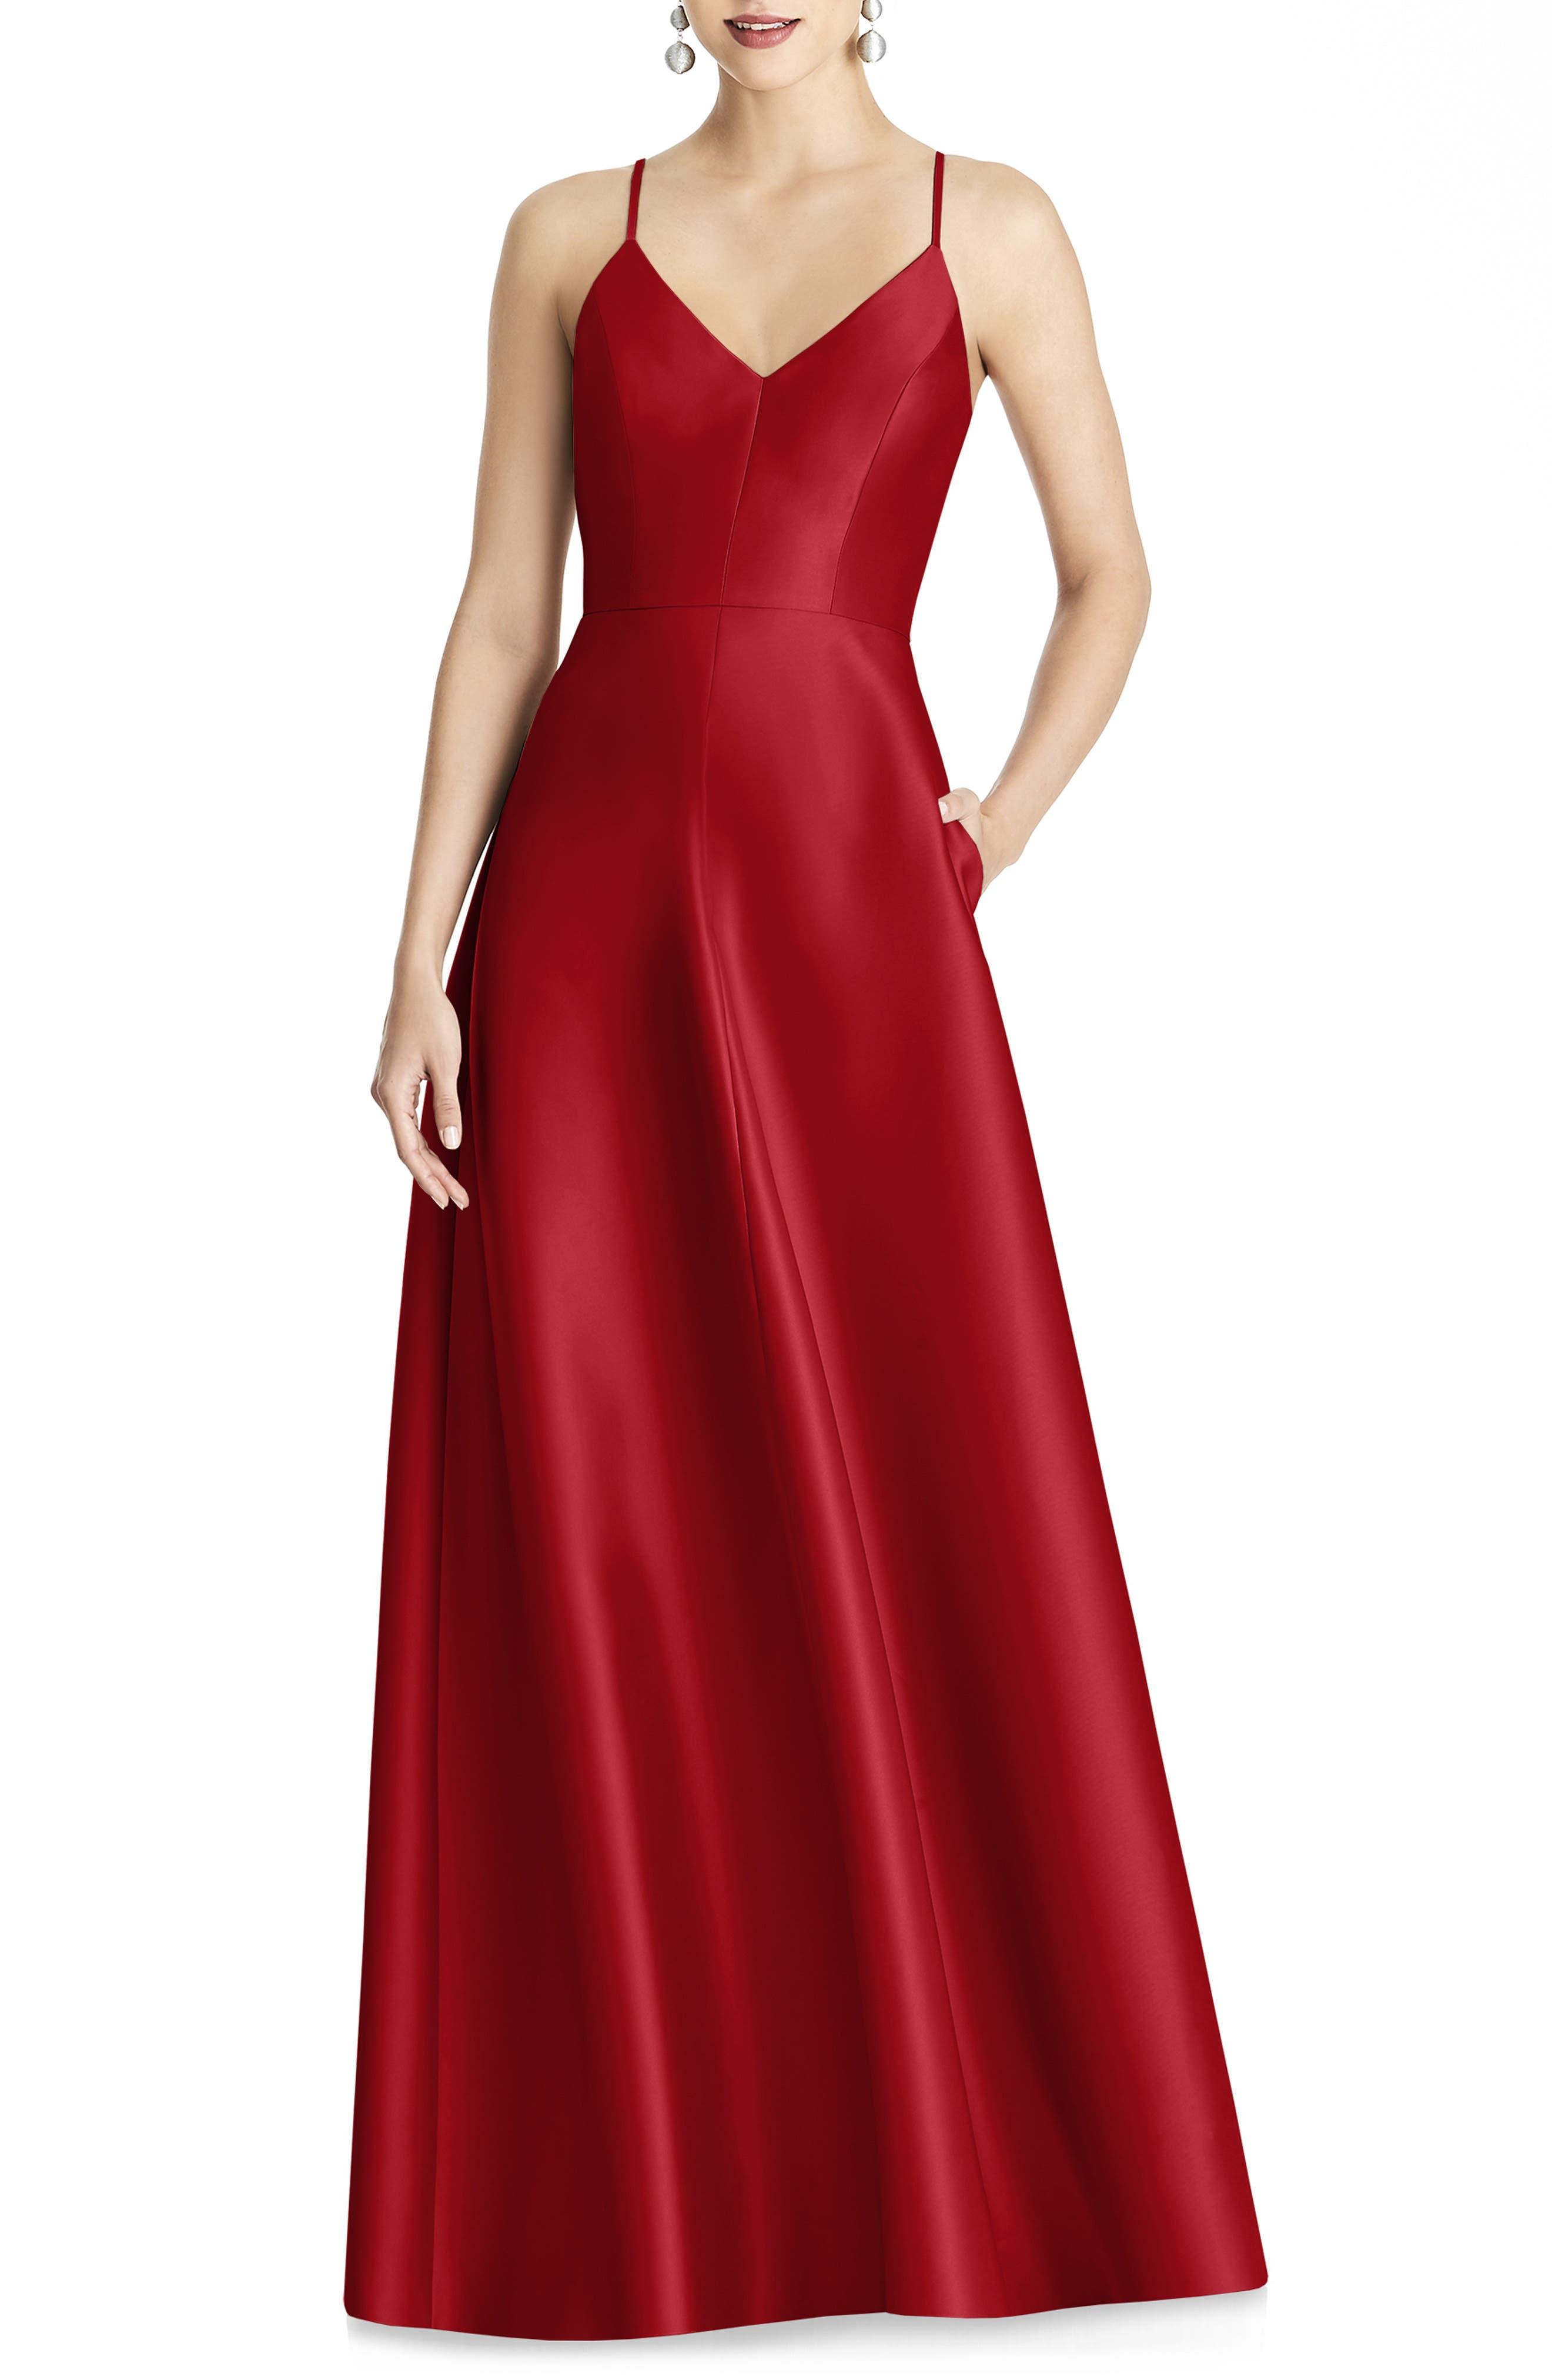 2b60c8cda5428 Women's Satin Dresses | Nordstrom